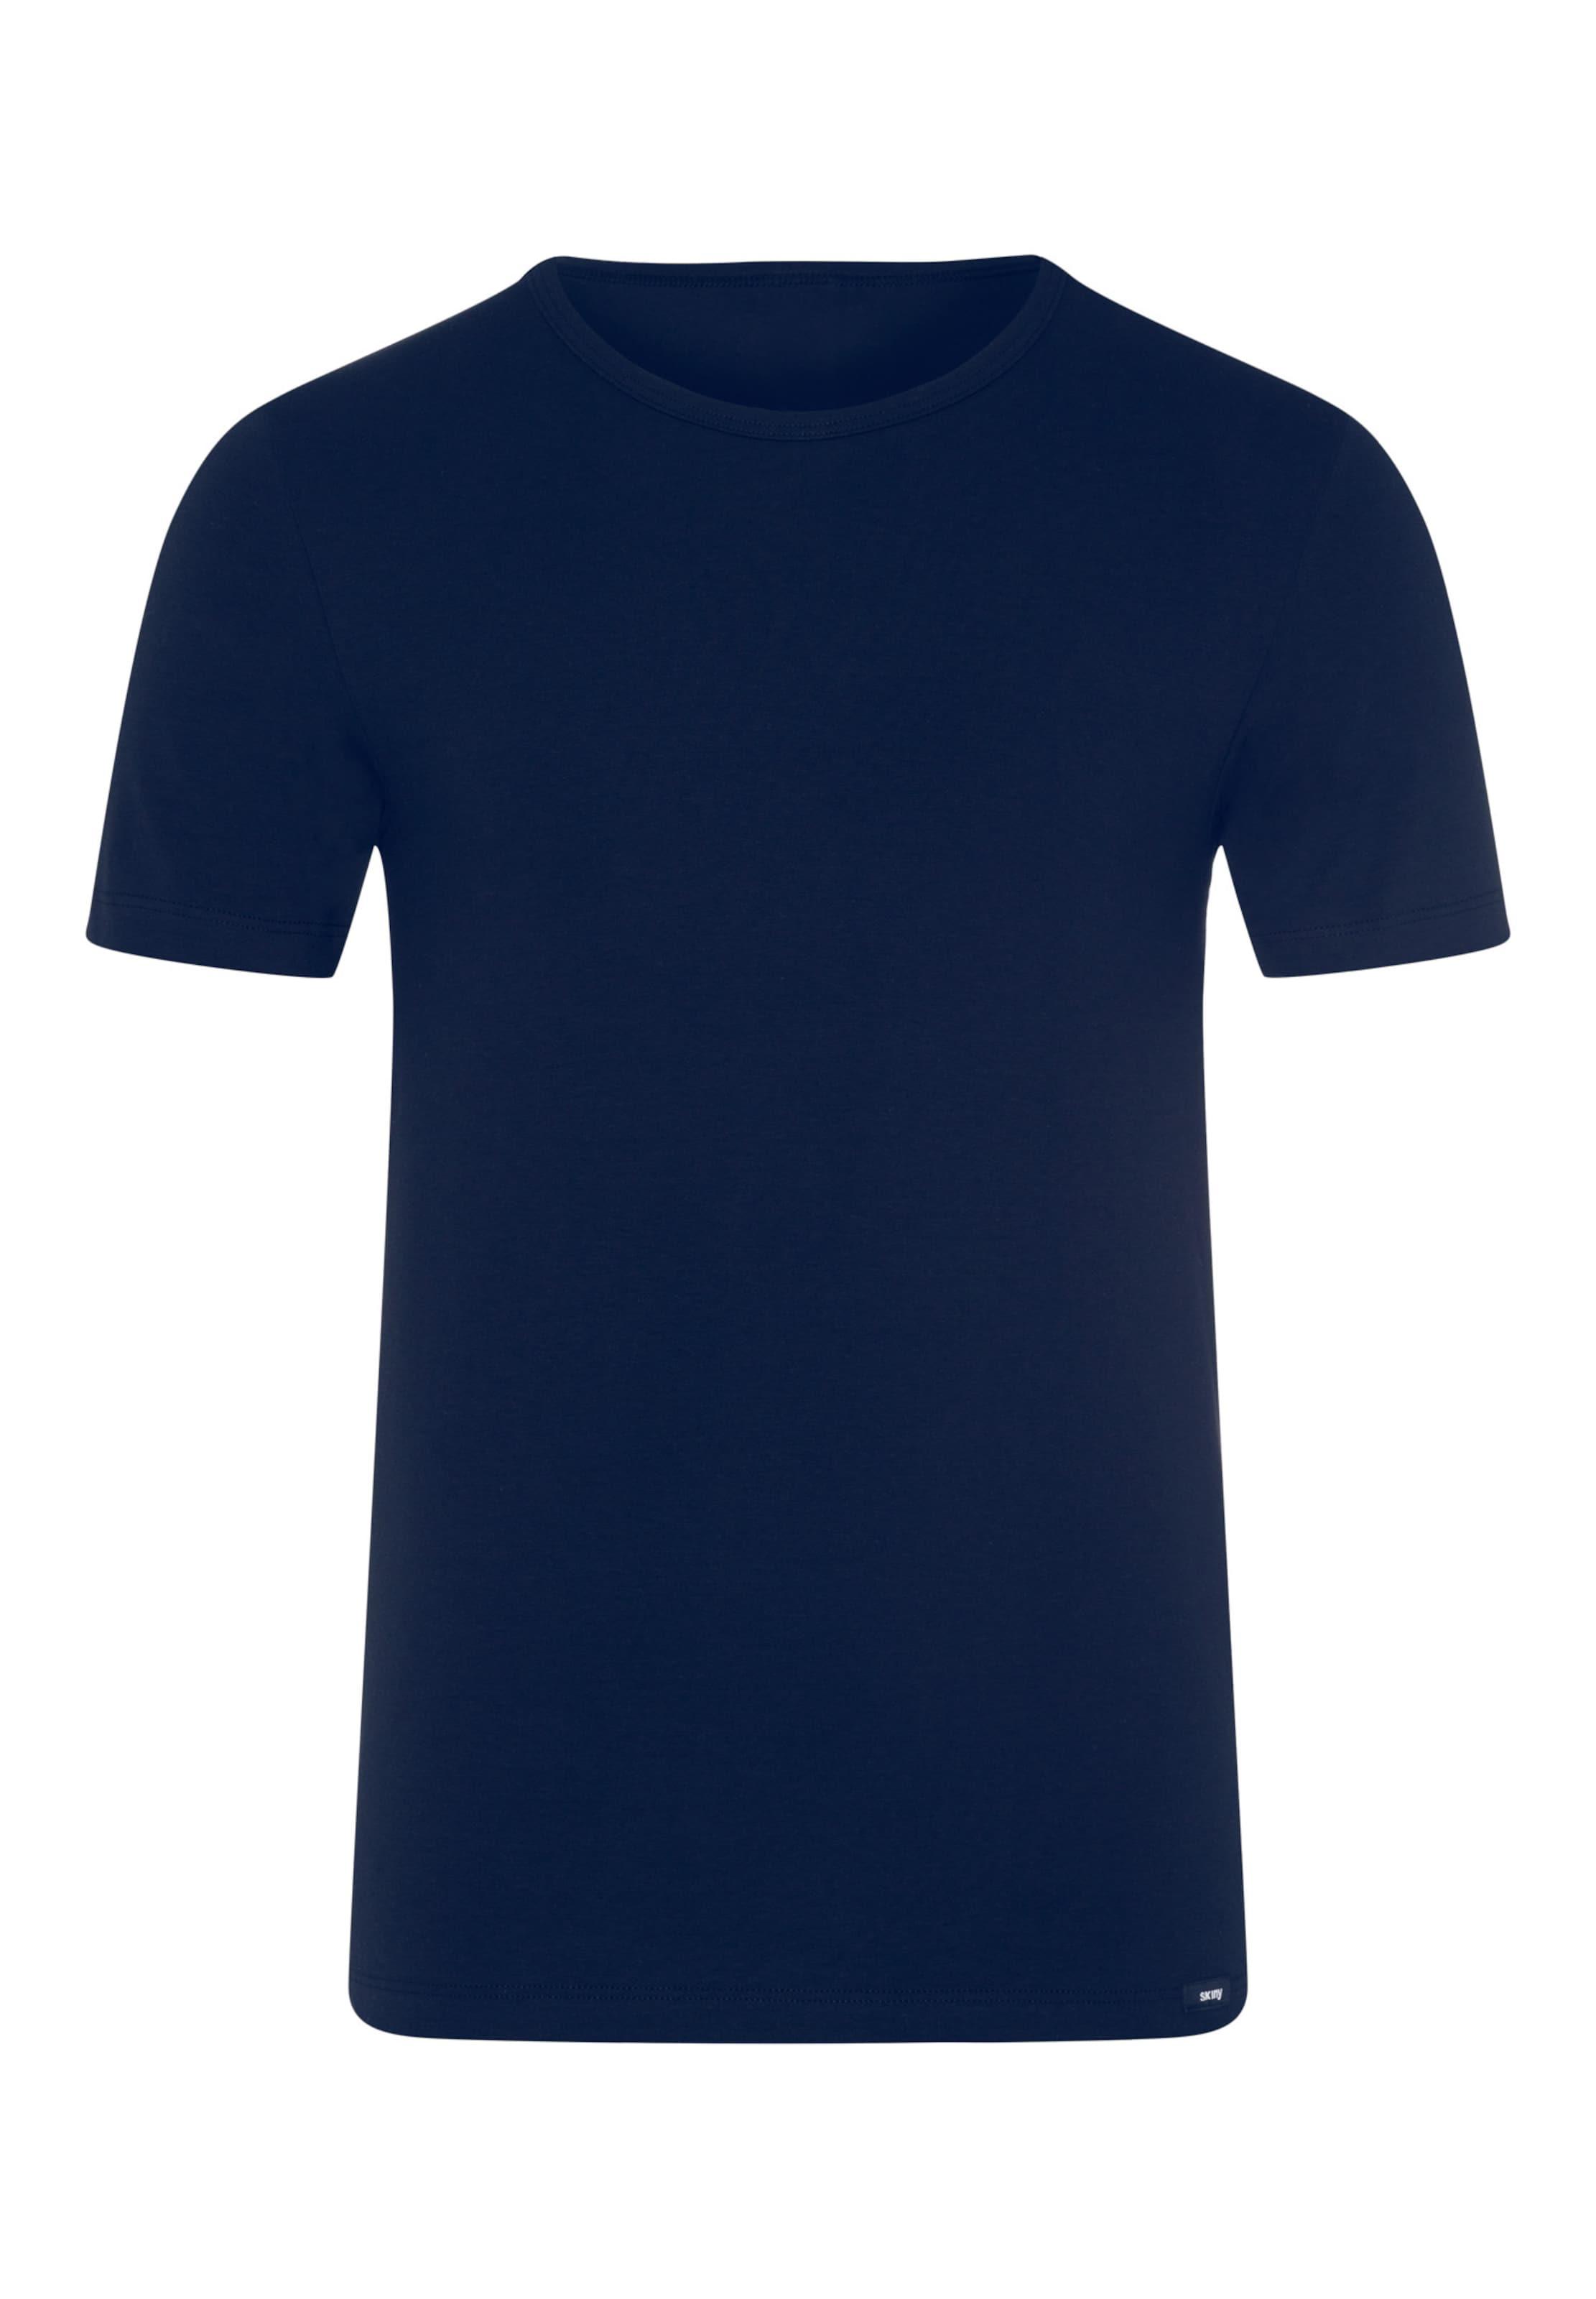 Blau Unterhemd In Skiny Skiny Unterhemd rxCBWode